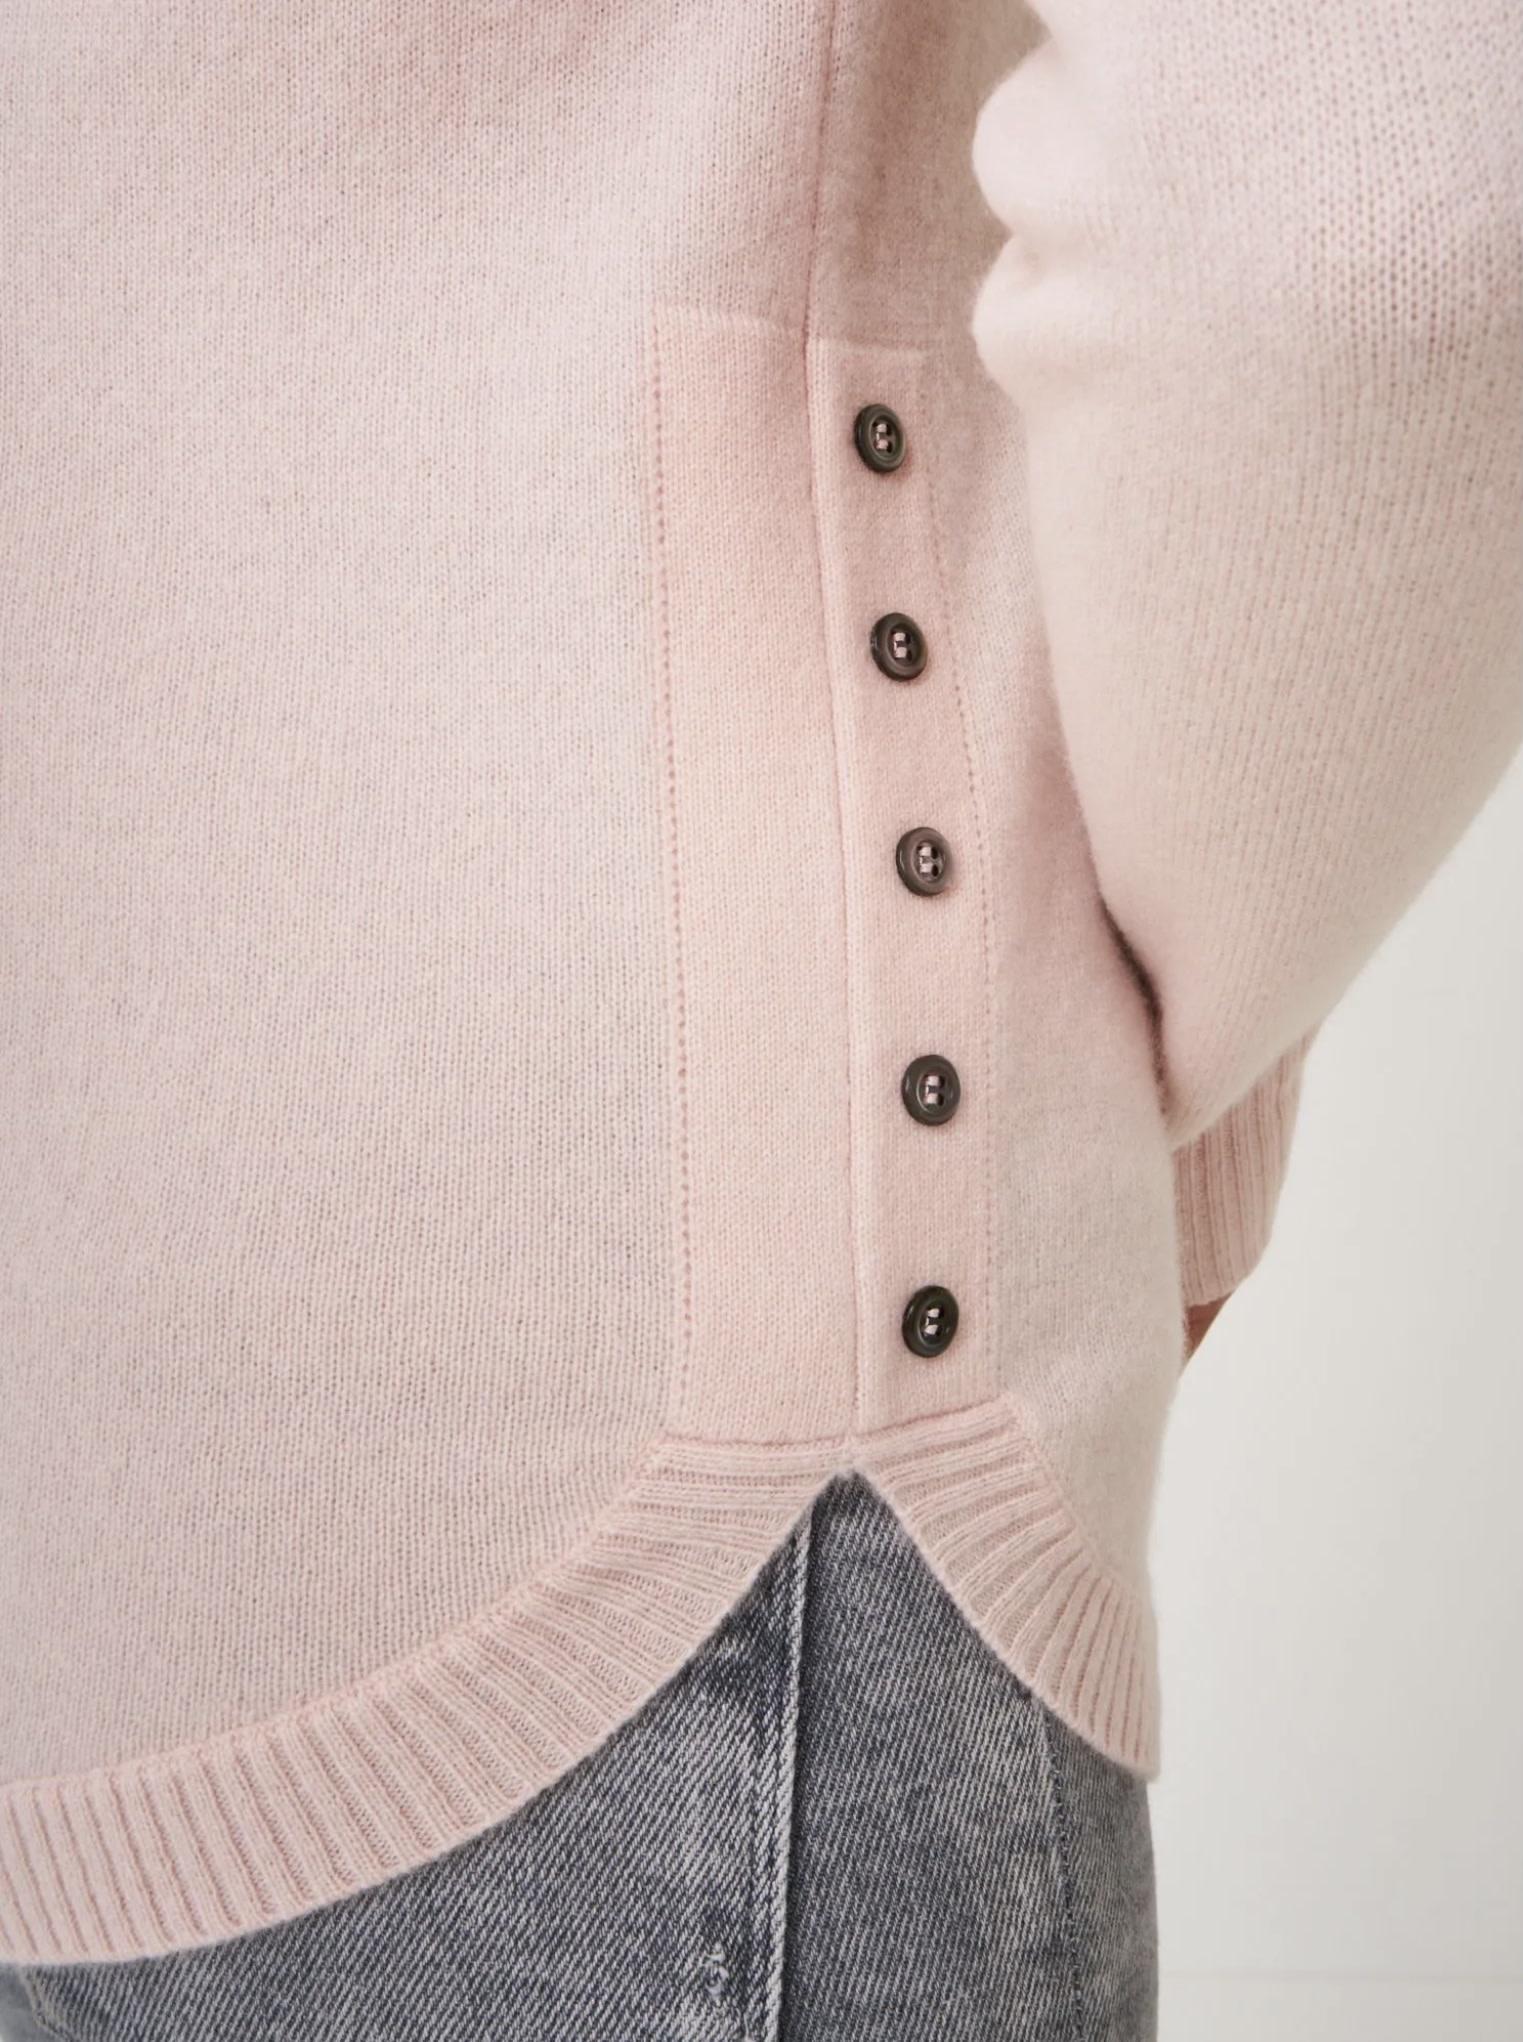 sweater repeat 100566-3